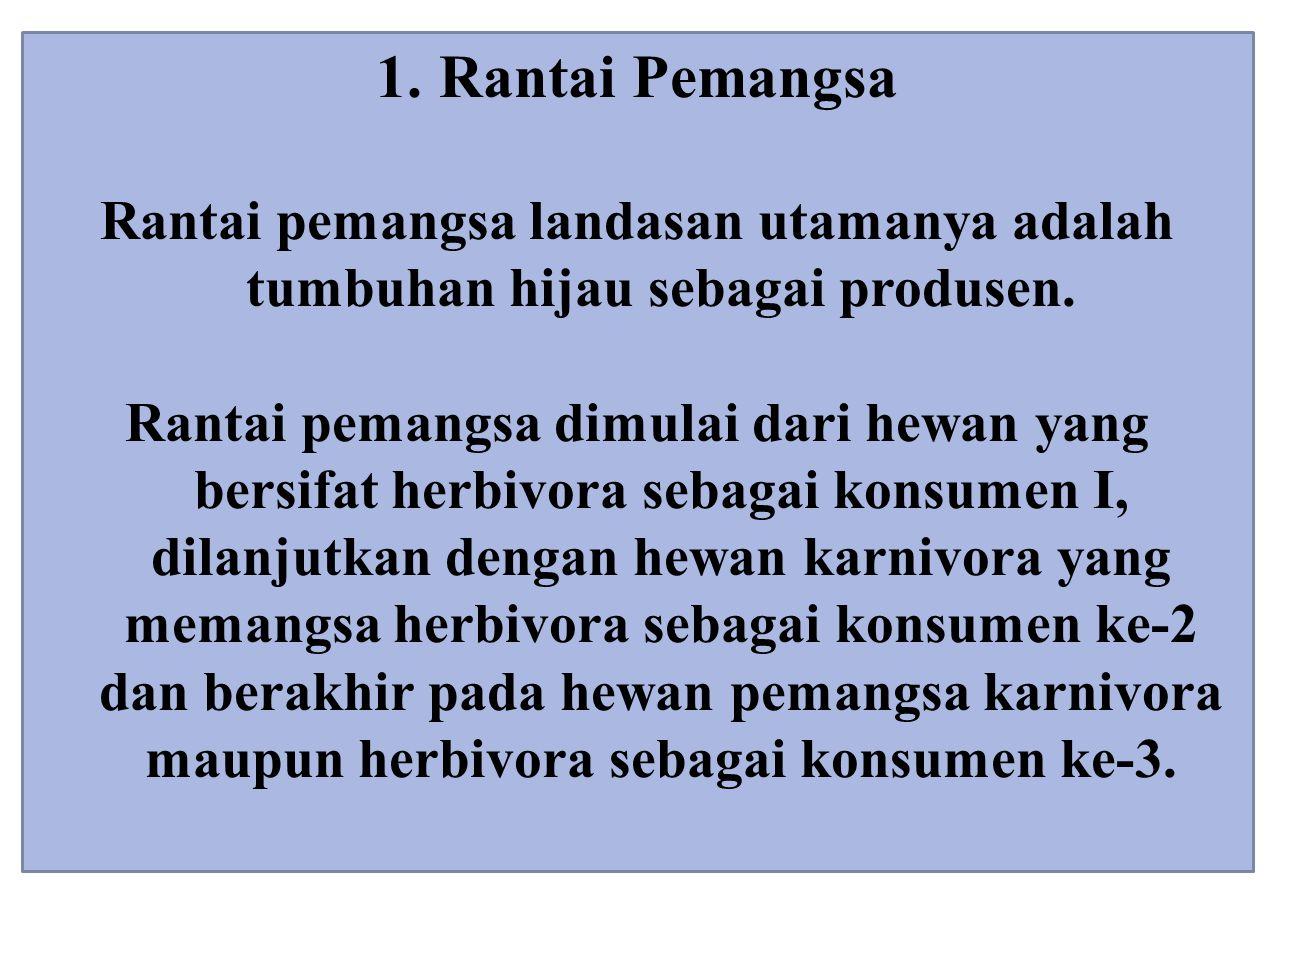 1. Rantai Pemangsa Rantai pemangsa landasan utamanya adalah tumbuhan hijau sebagai produsen. Rantai pemangsa dimulai dari hewan yang bersifat herbivor